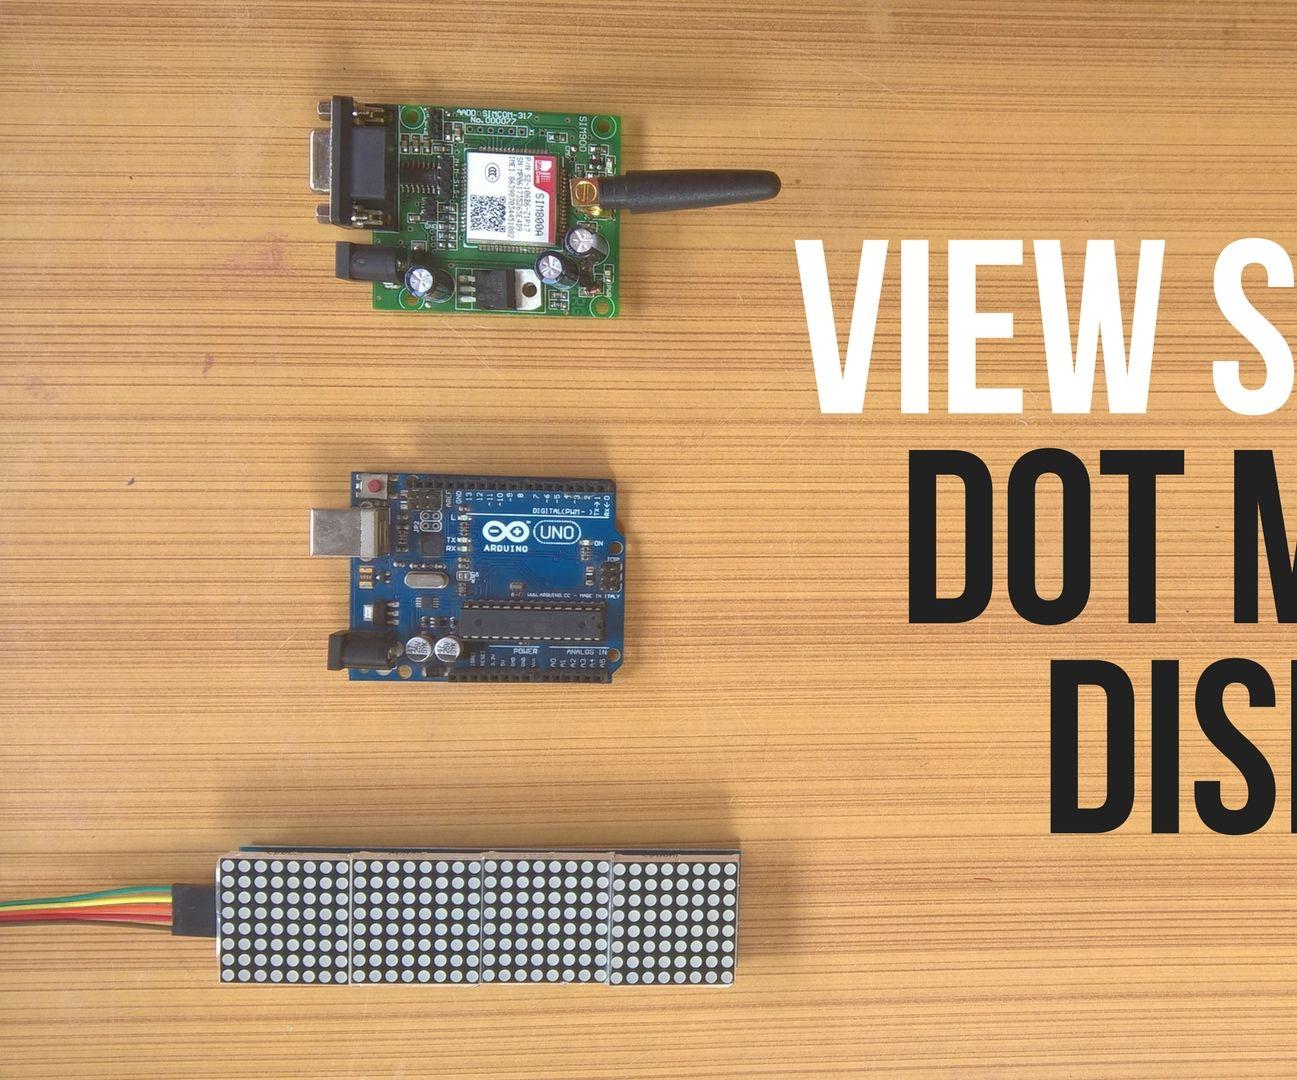 View SMS on a Dot Matrix Display